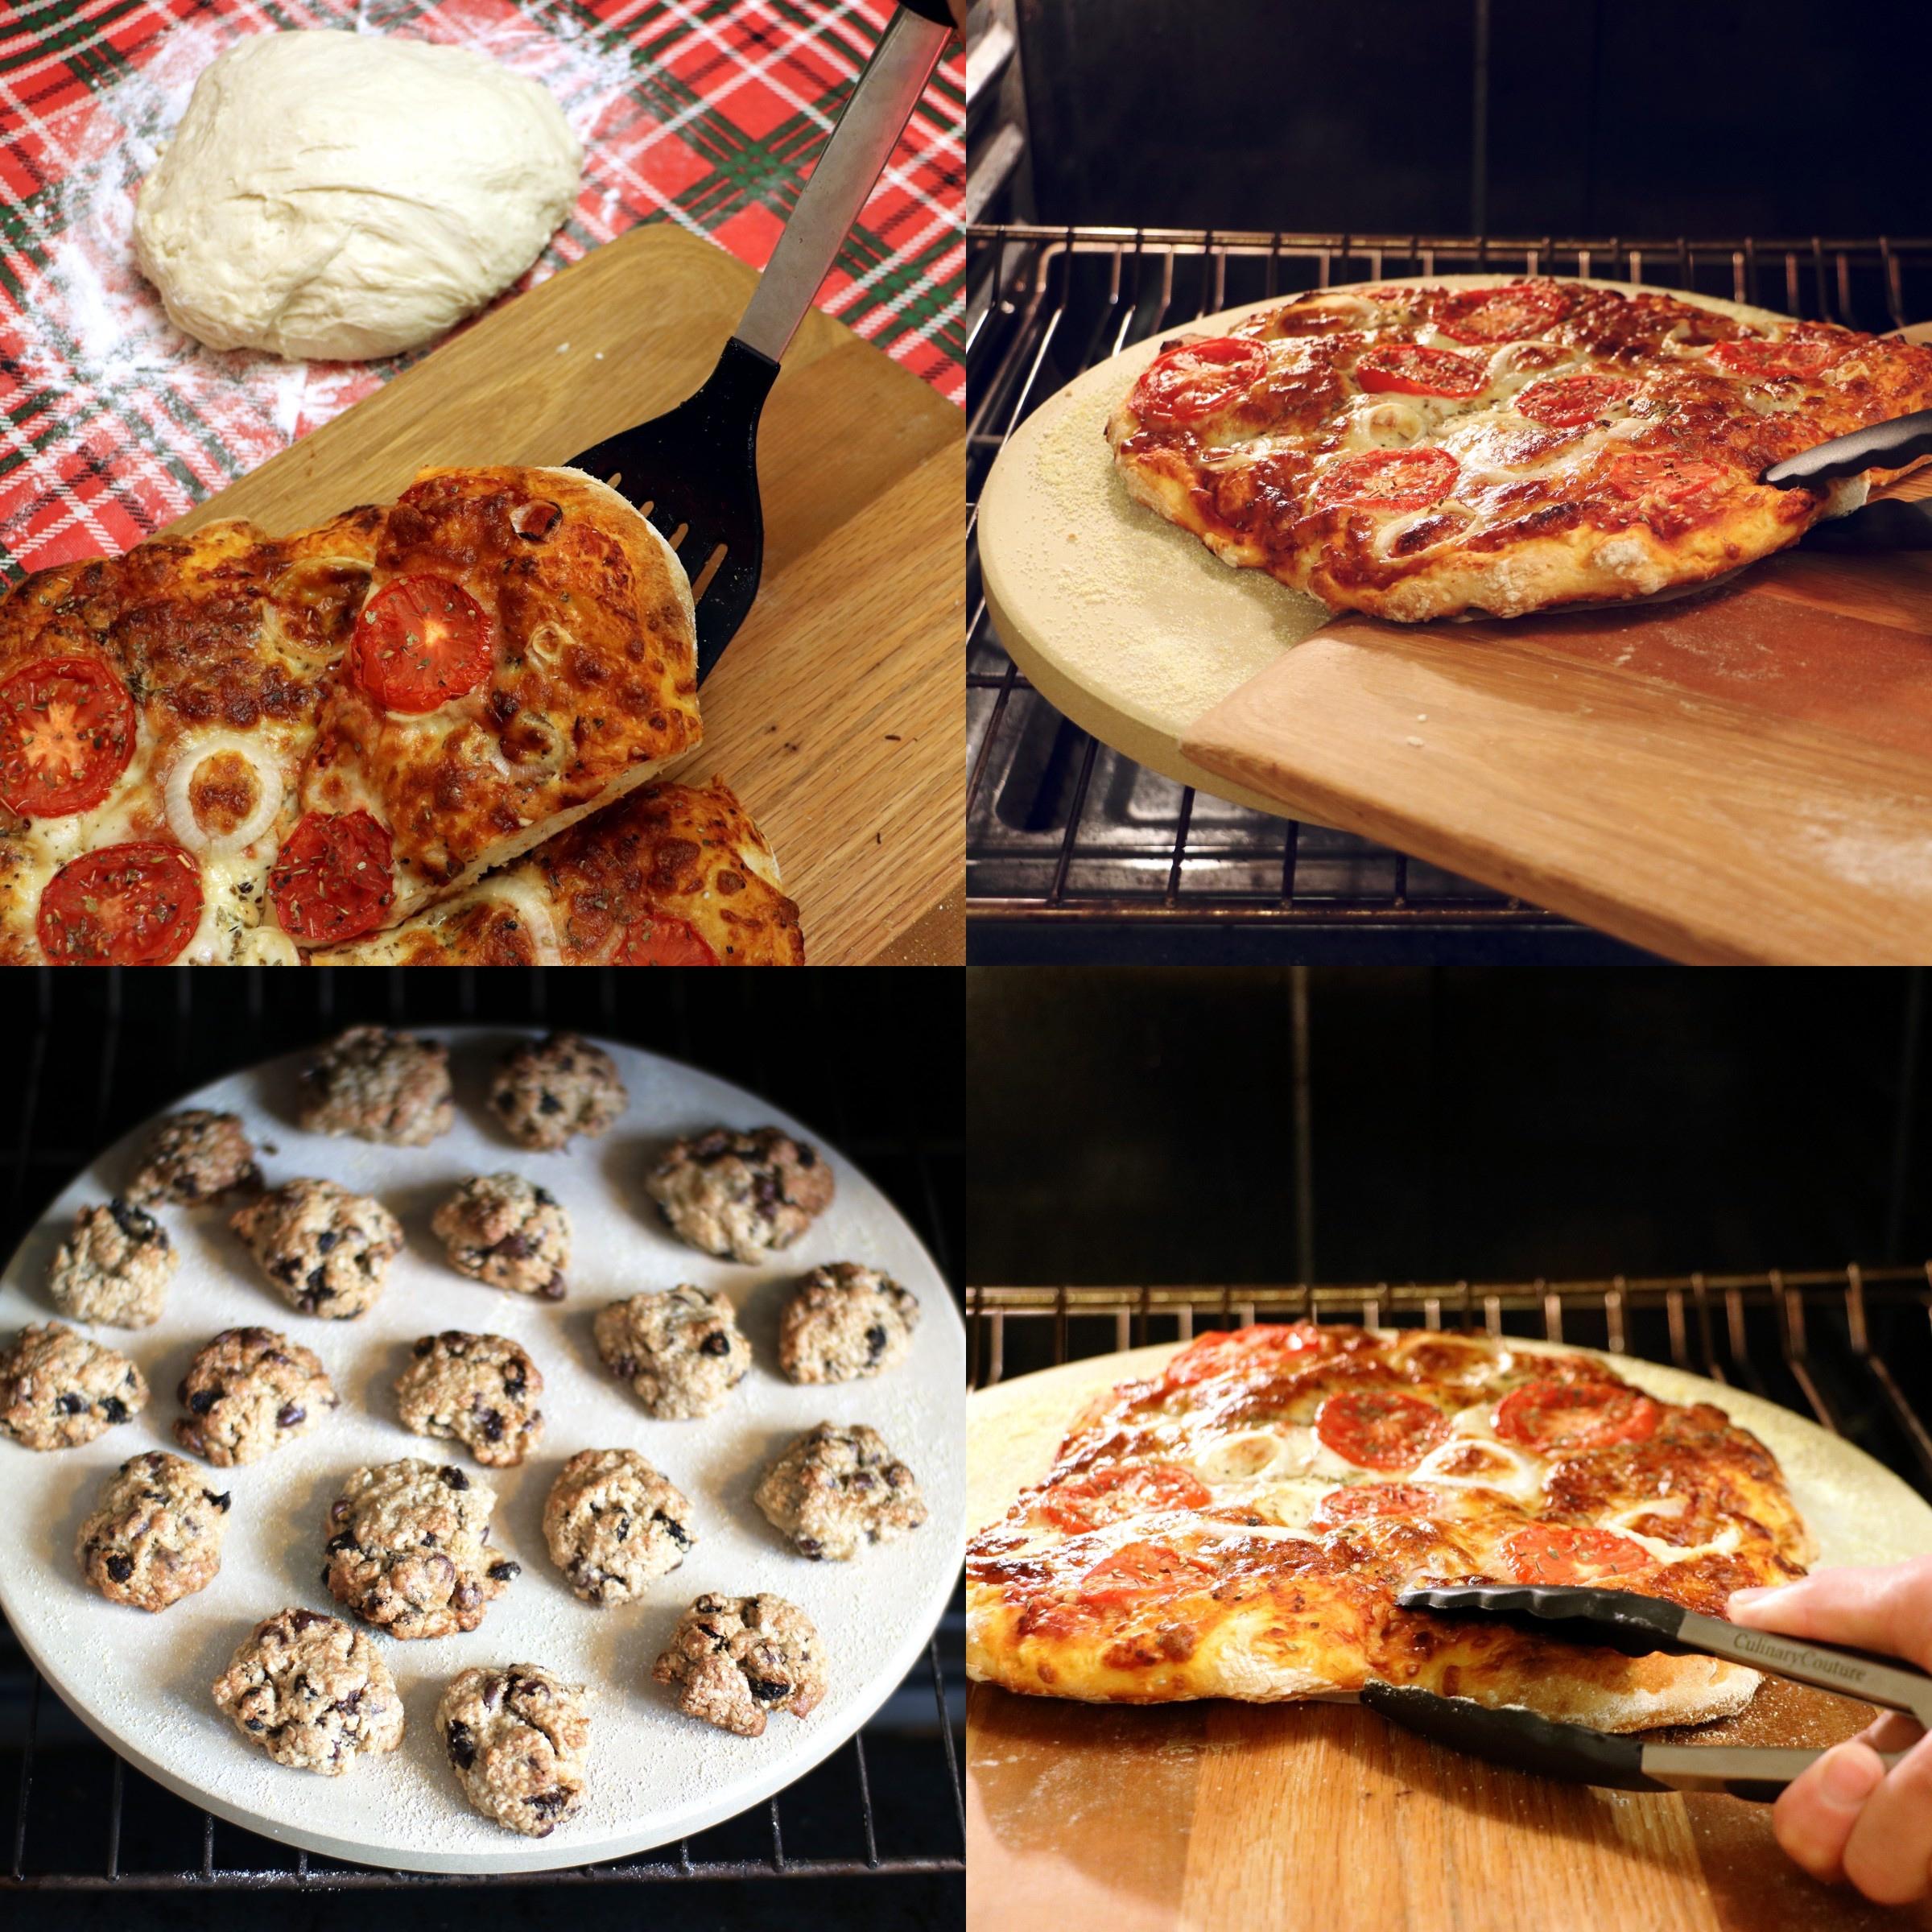 Pizza Utensils Cookies Collage